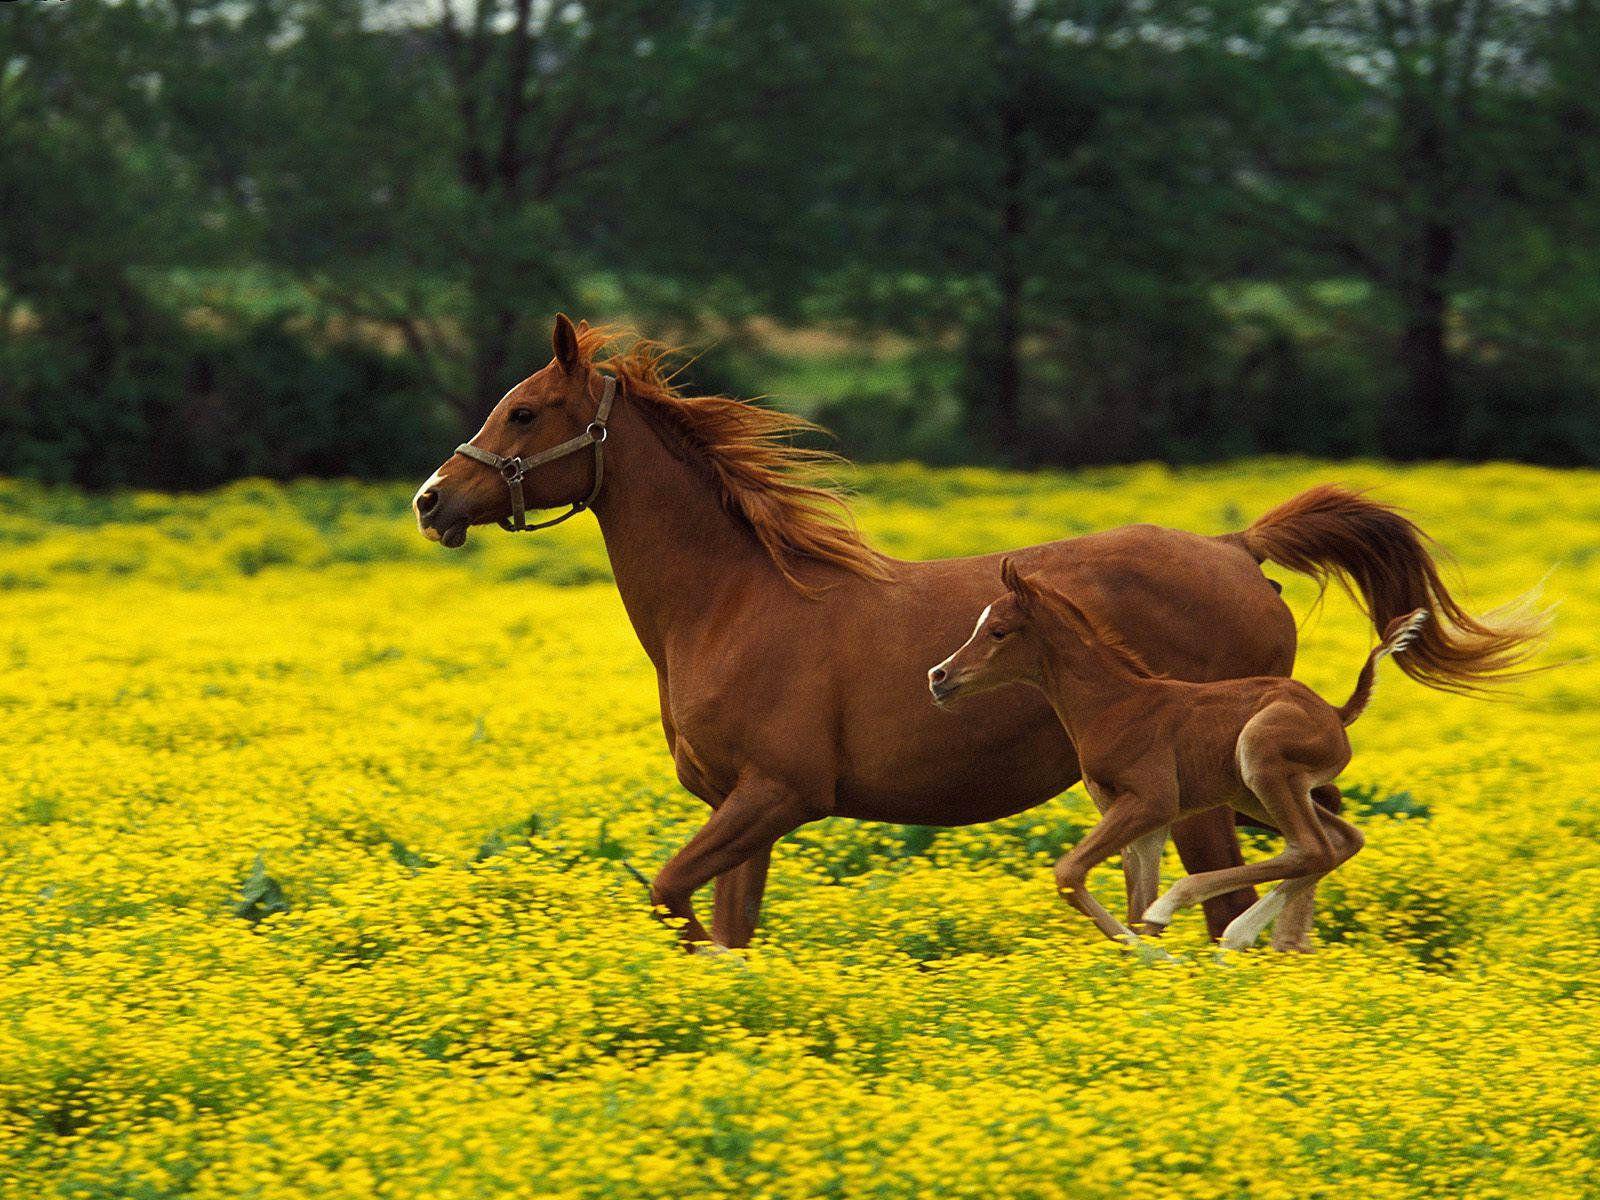 Beautiful Wallpaper Horse Yellow - 5fe5ca7d8b42b9bdd95058dd8afb6c55  Graphic_644964.jpg